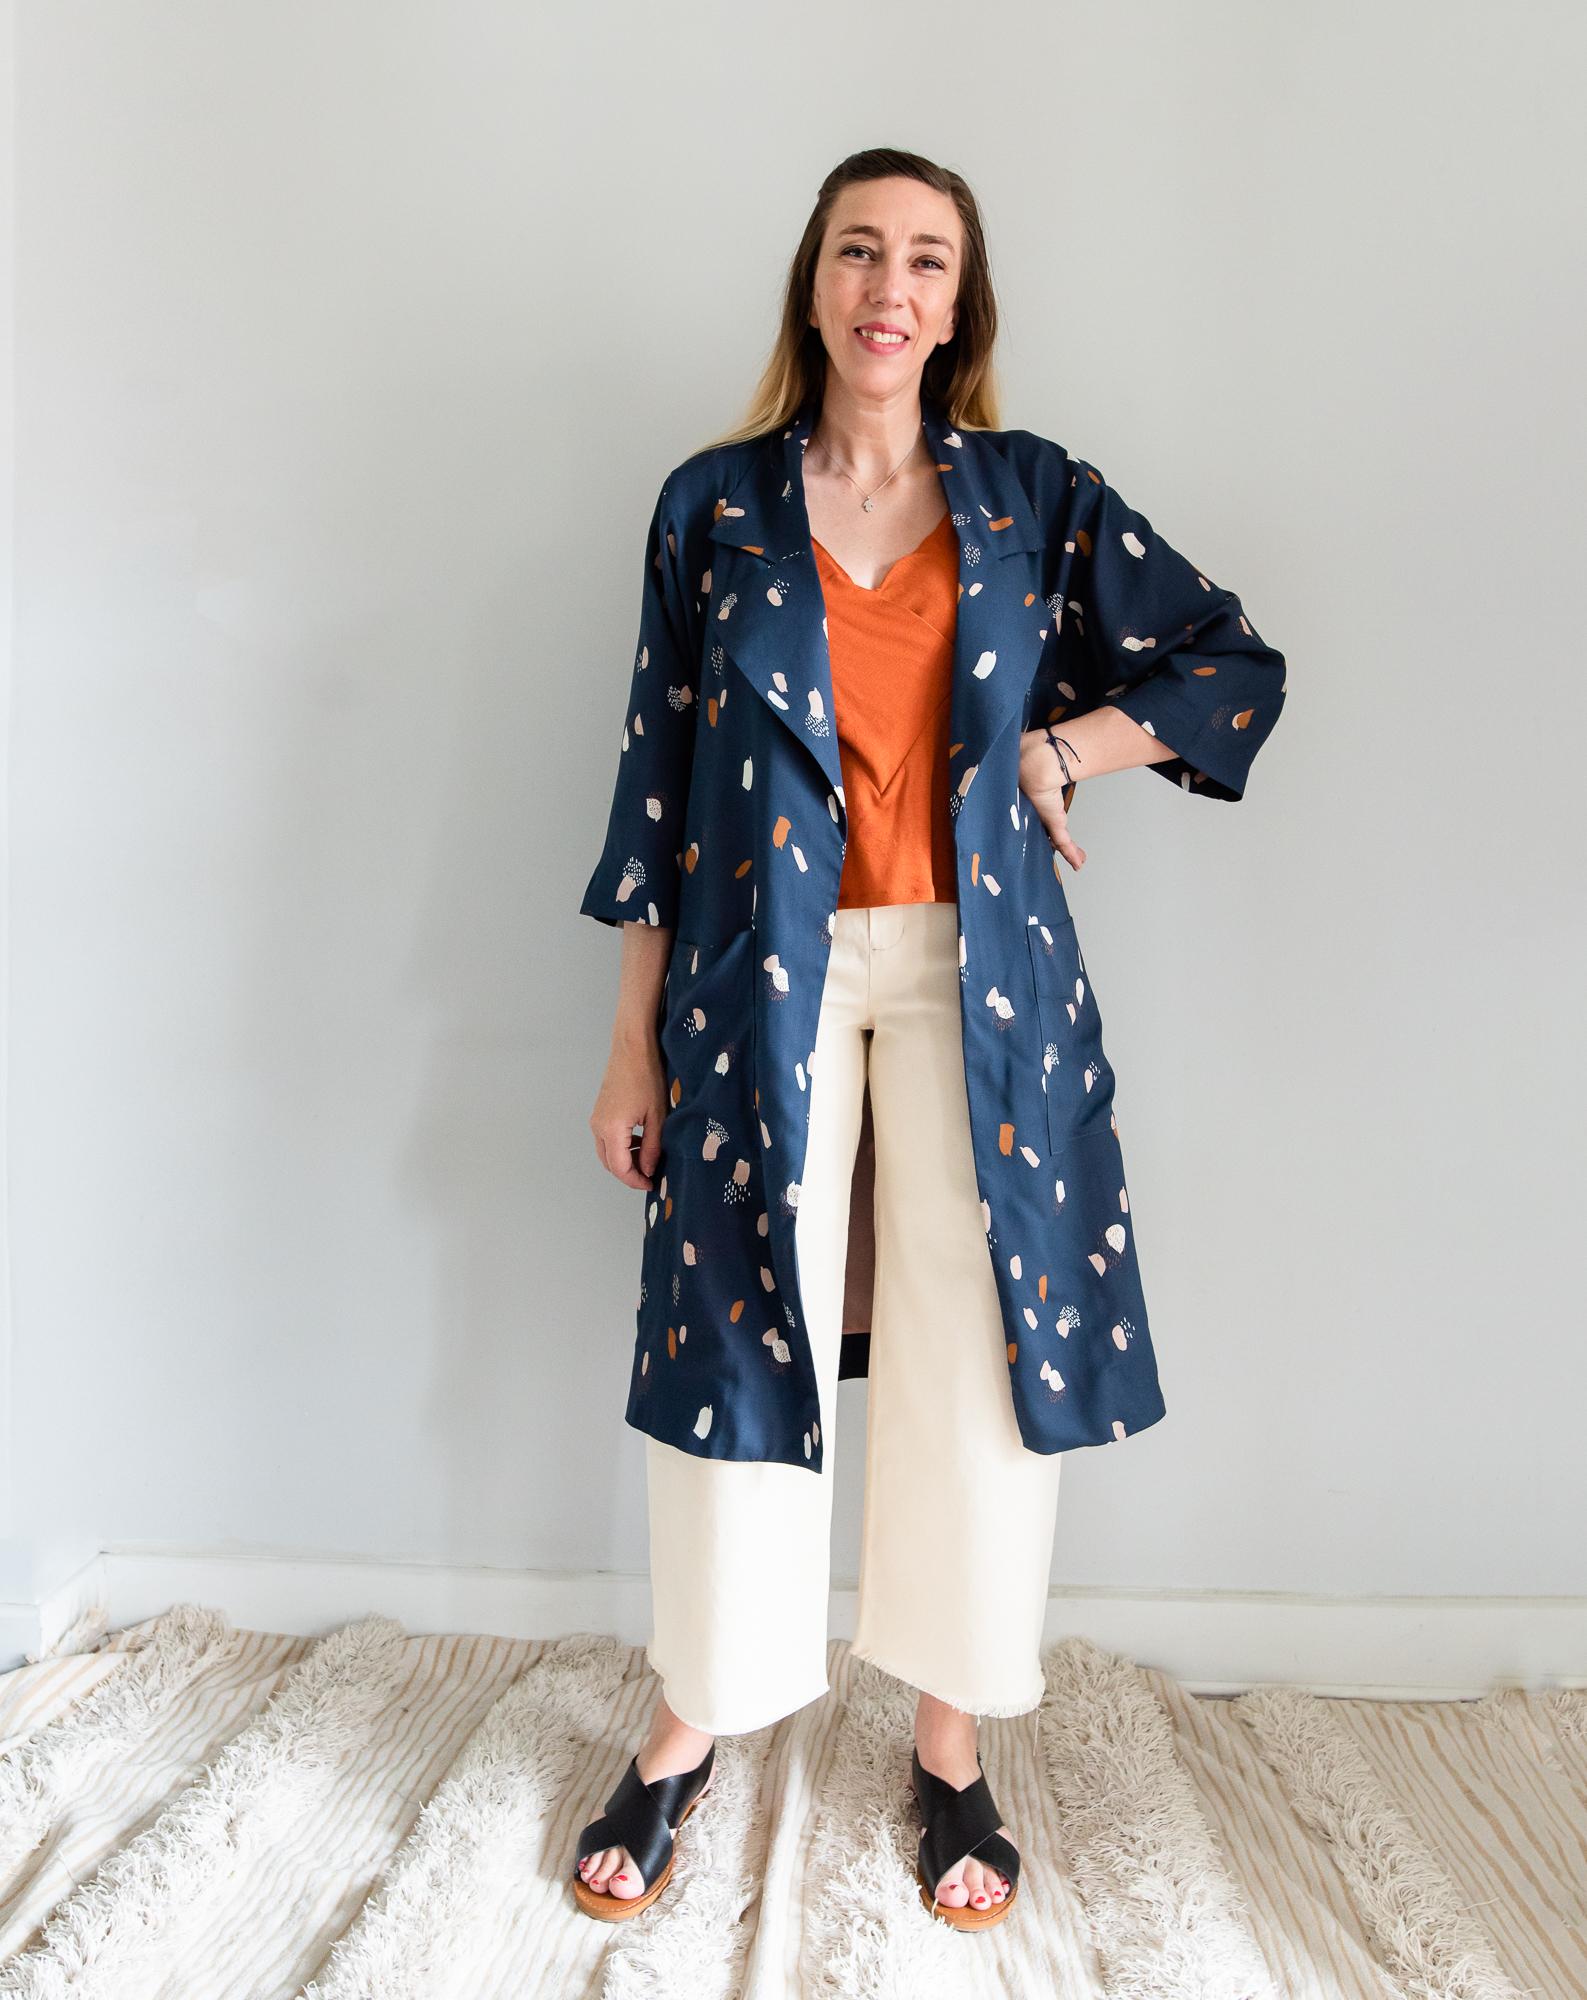 Atelier Brunette Surtout Coat01.jpg